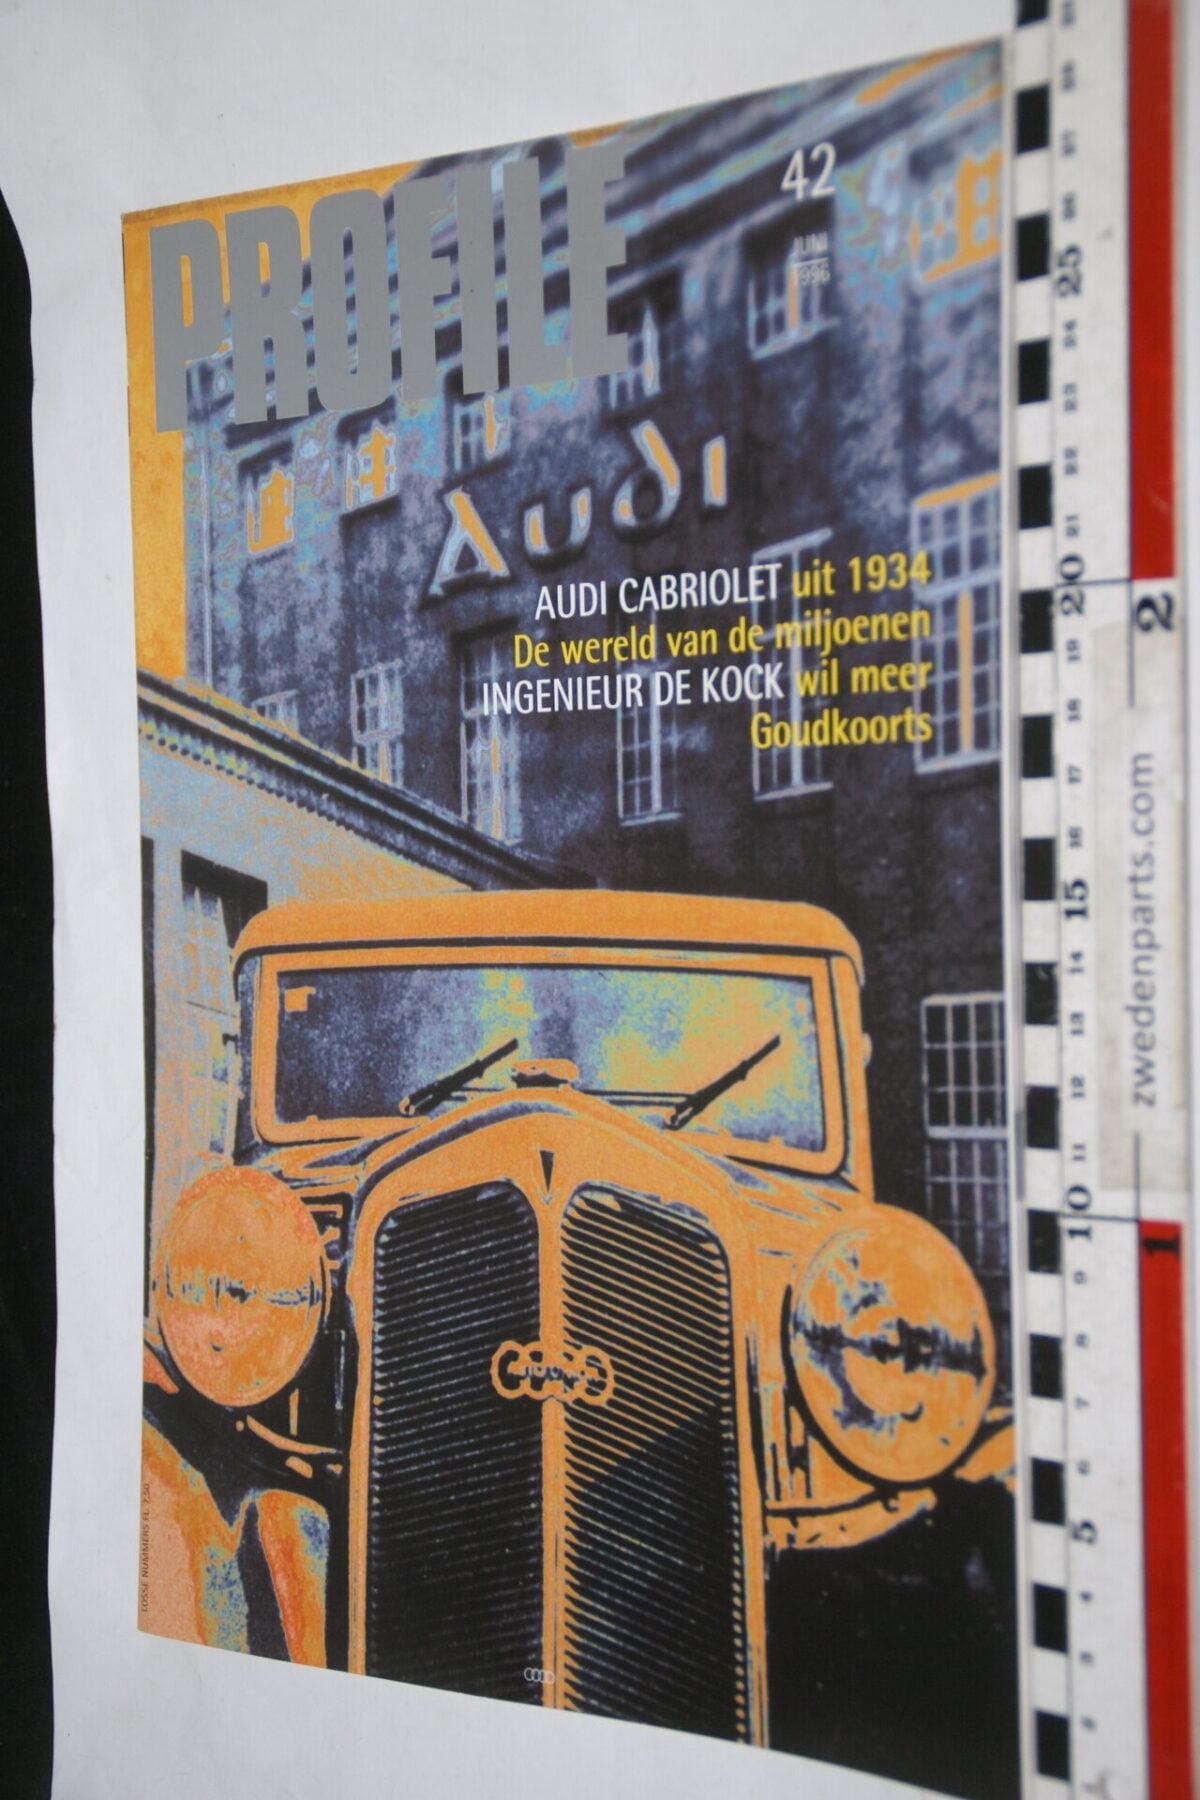 DSC01252 1996 juni tijdschrift Profile 1934 Audi Cabrio nr 42-016b6f1d